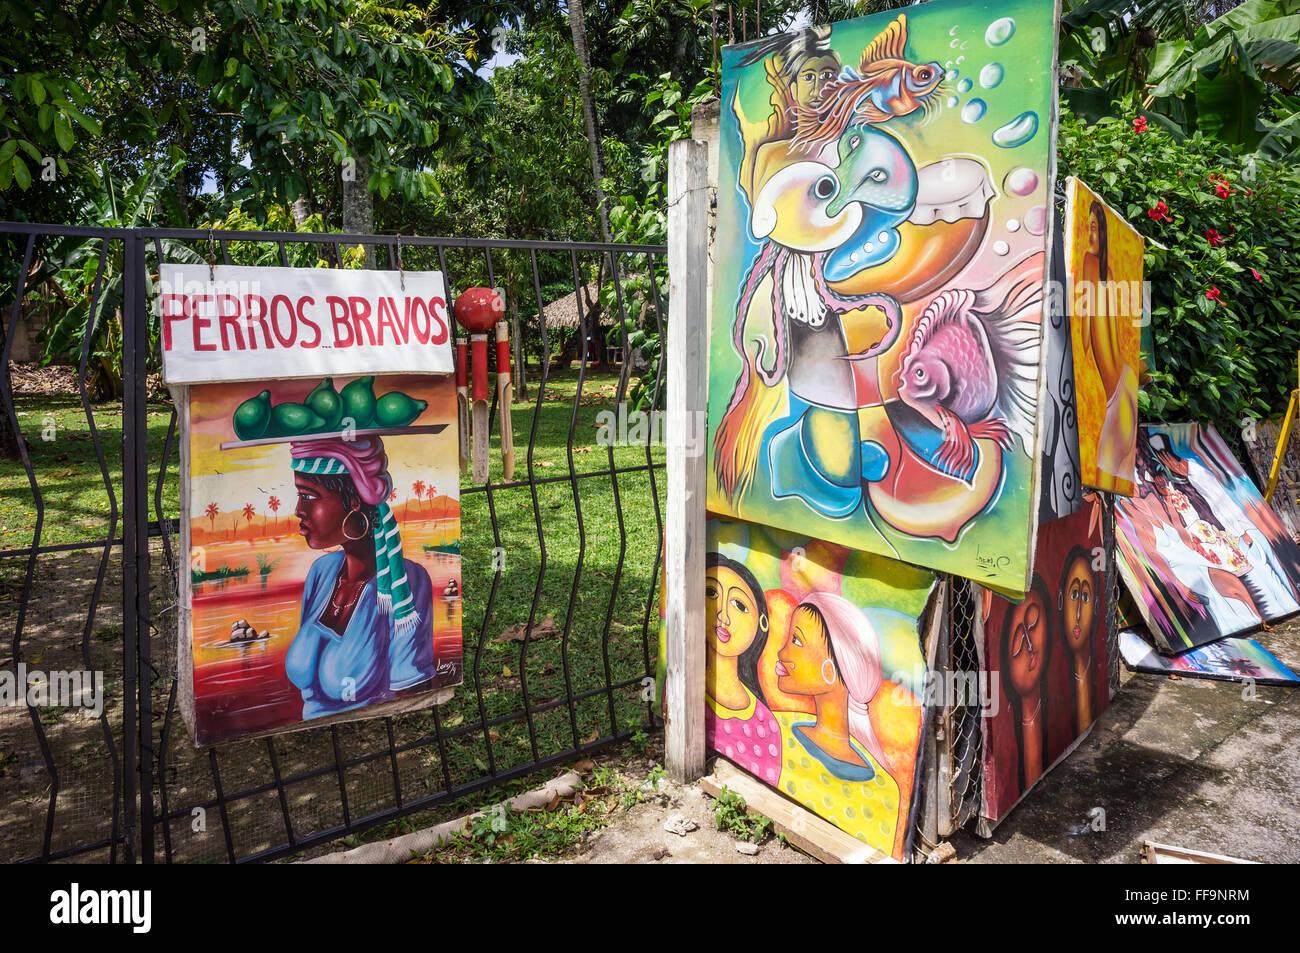 Naive paintings. Las Terrenas. Samana Peninsula. Dominican Republic. West Indies. Caribbean - Stock Image